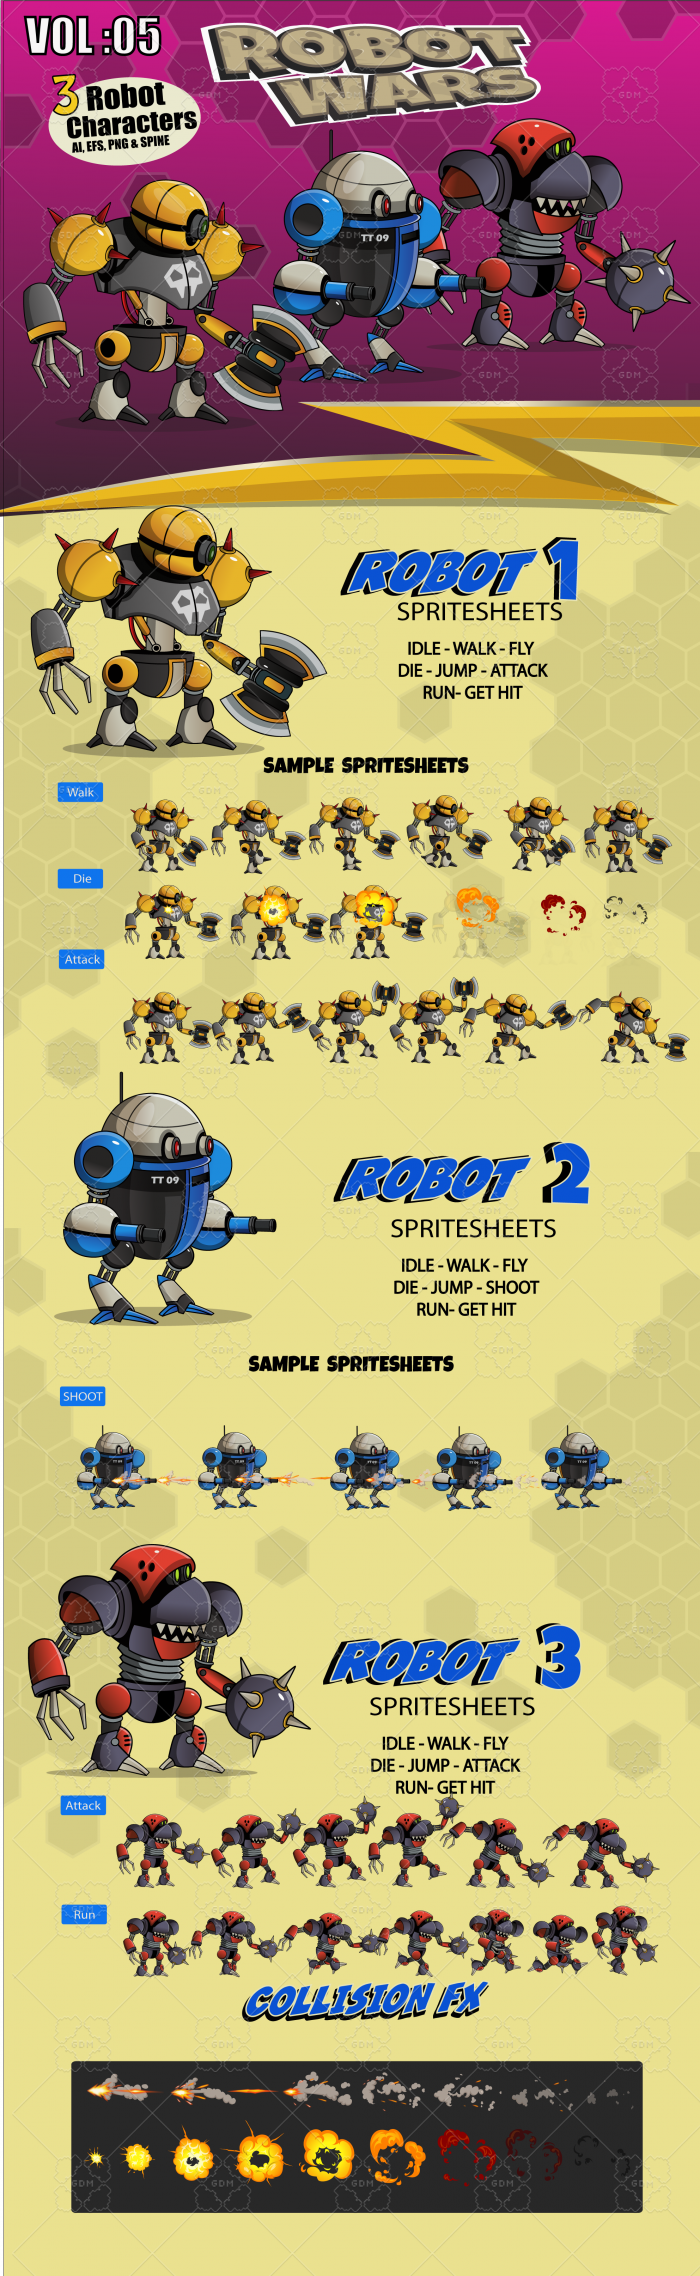 Robot Wars Vol: 05